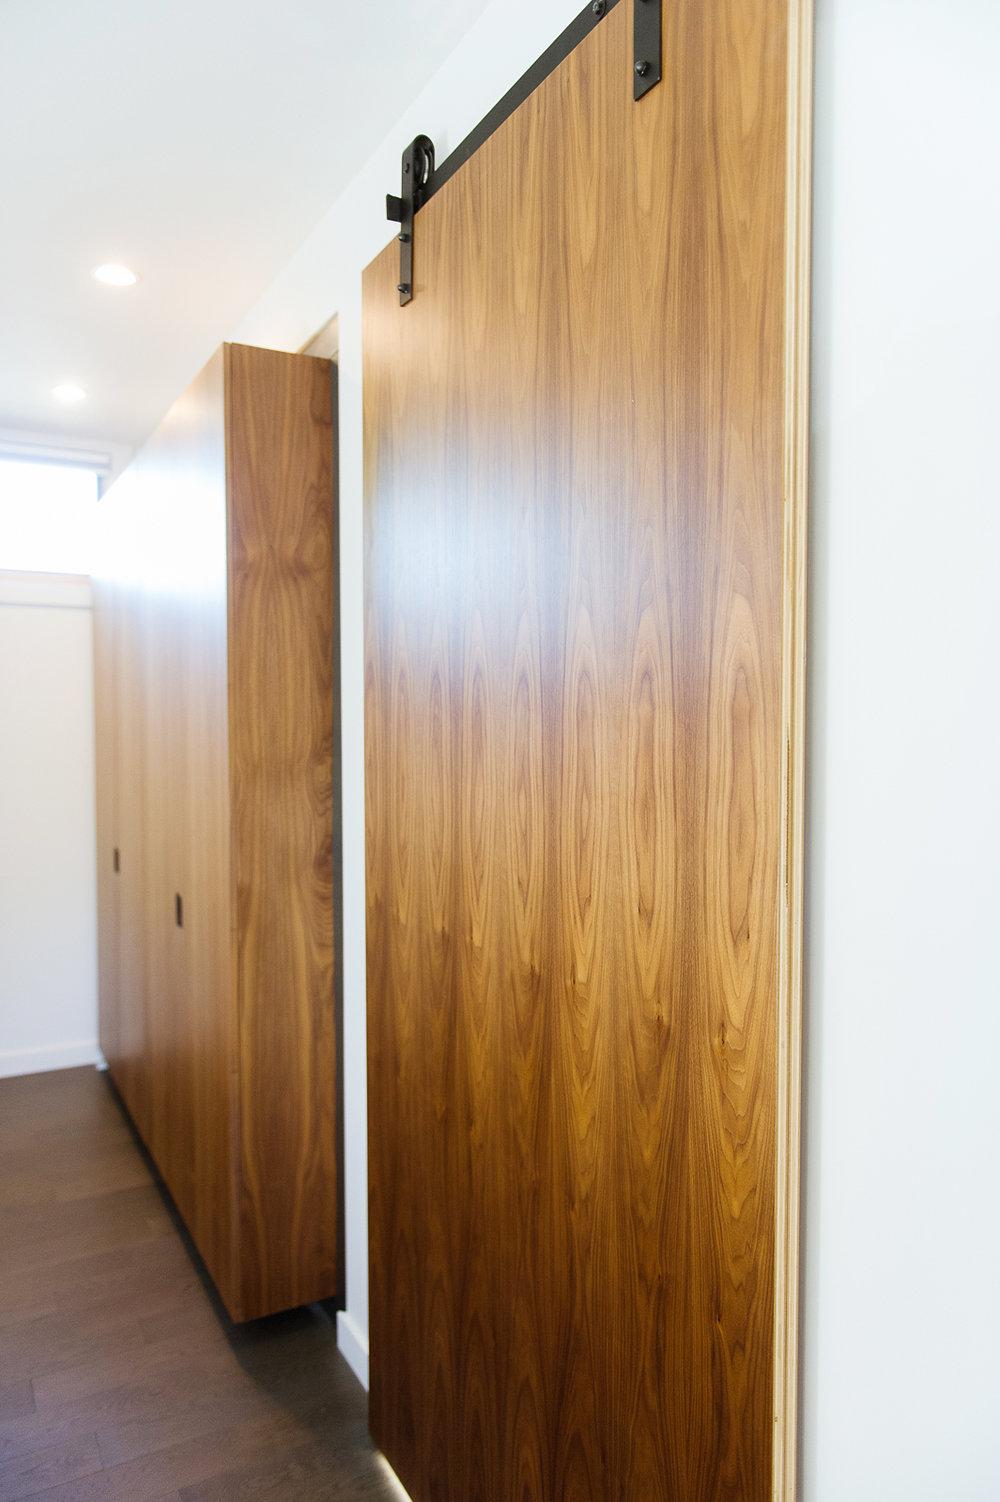 Woodworks-West-Bozeman-Montana-Builder-Cabinetry-Remodel-New-Construction-2504.jpg